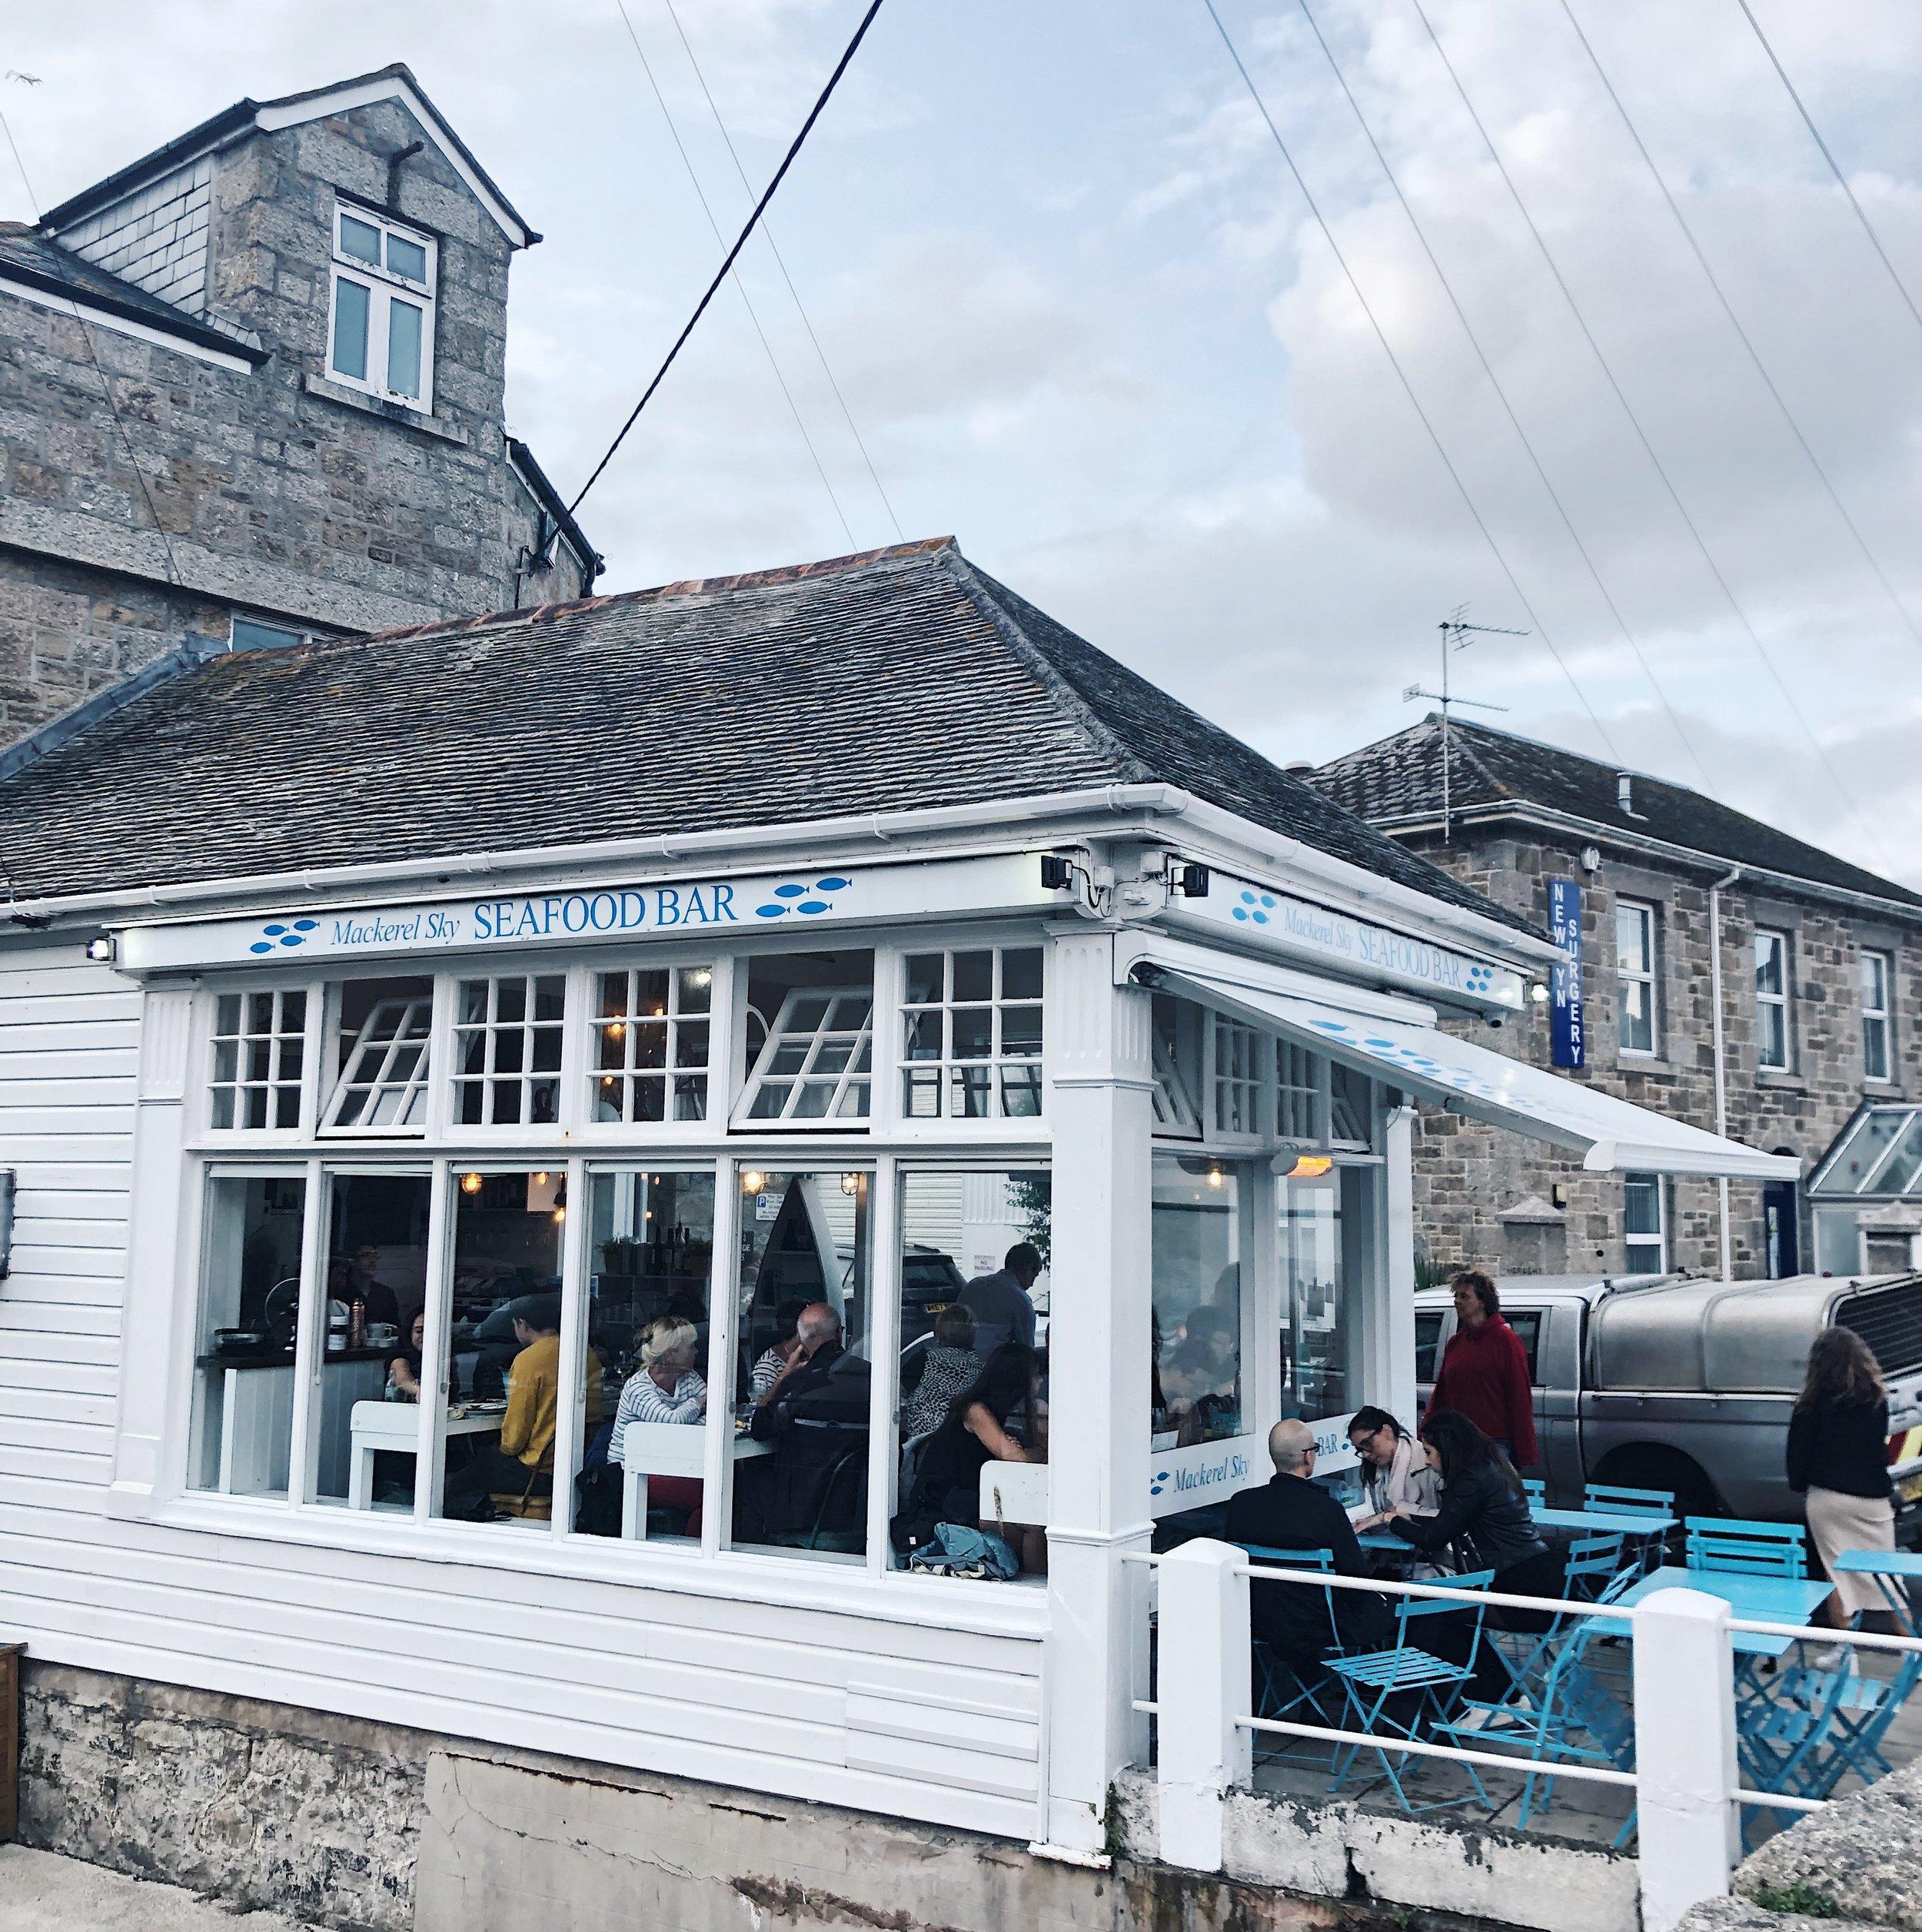 The cute and wonderful Mackerel Sky Seafood Bar in Newlyn.